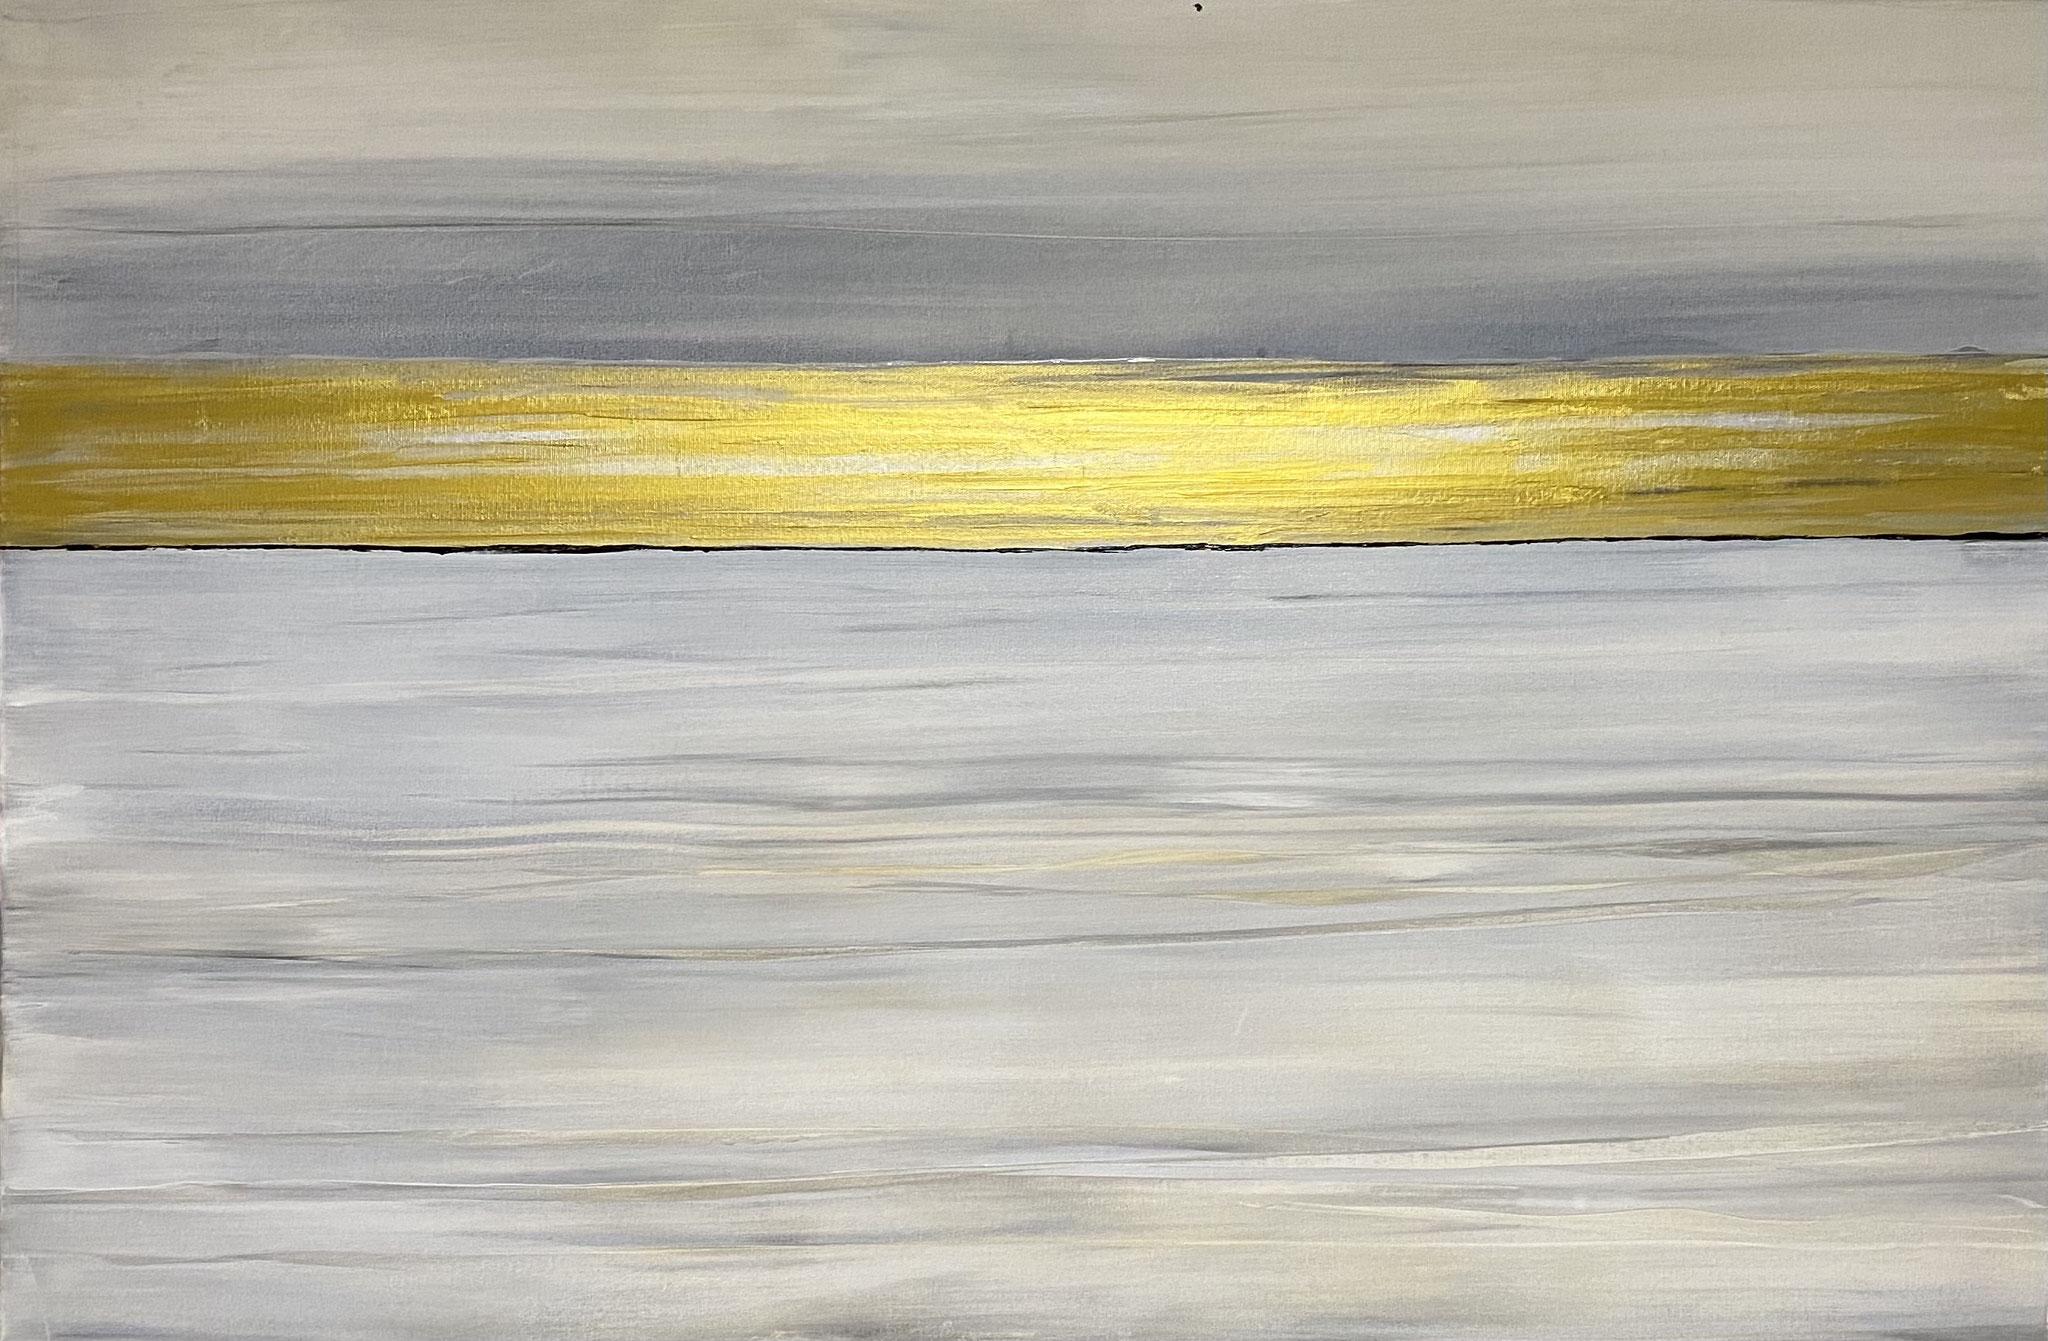 """Goldene Zukunft"" 120 x 80 cm - 1700,- Euro"